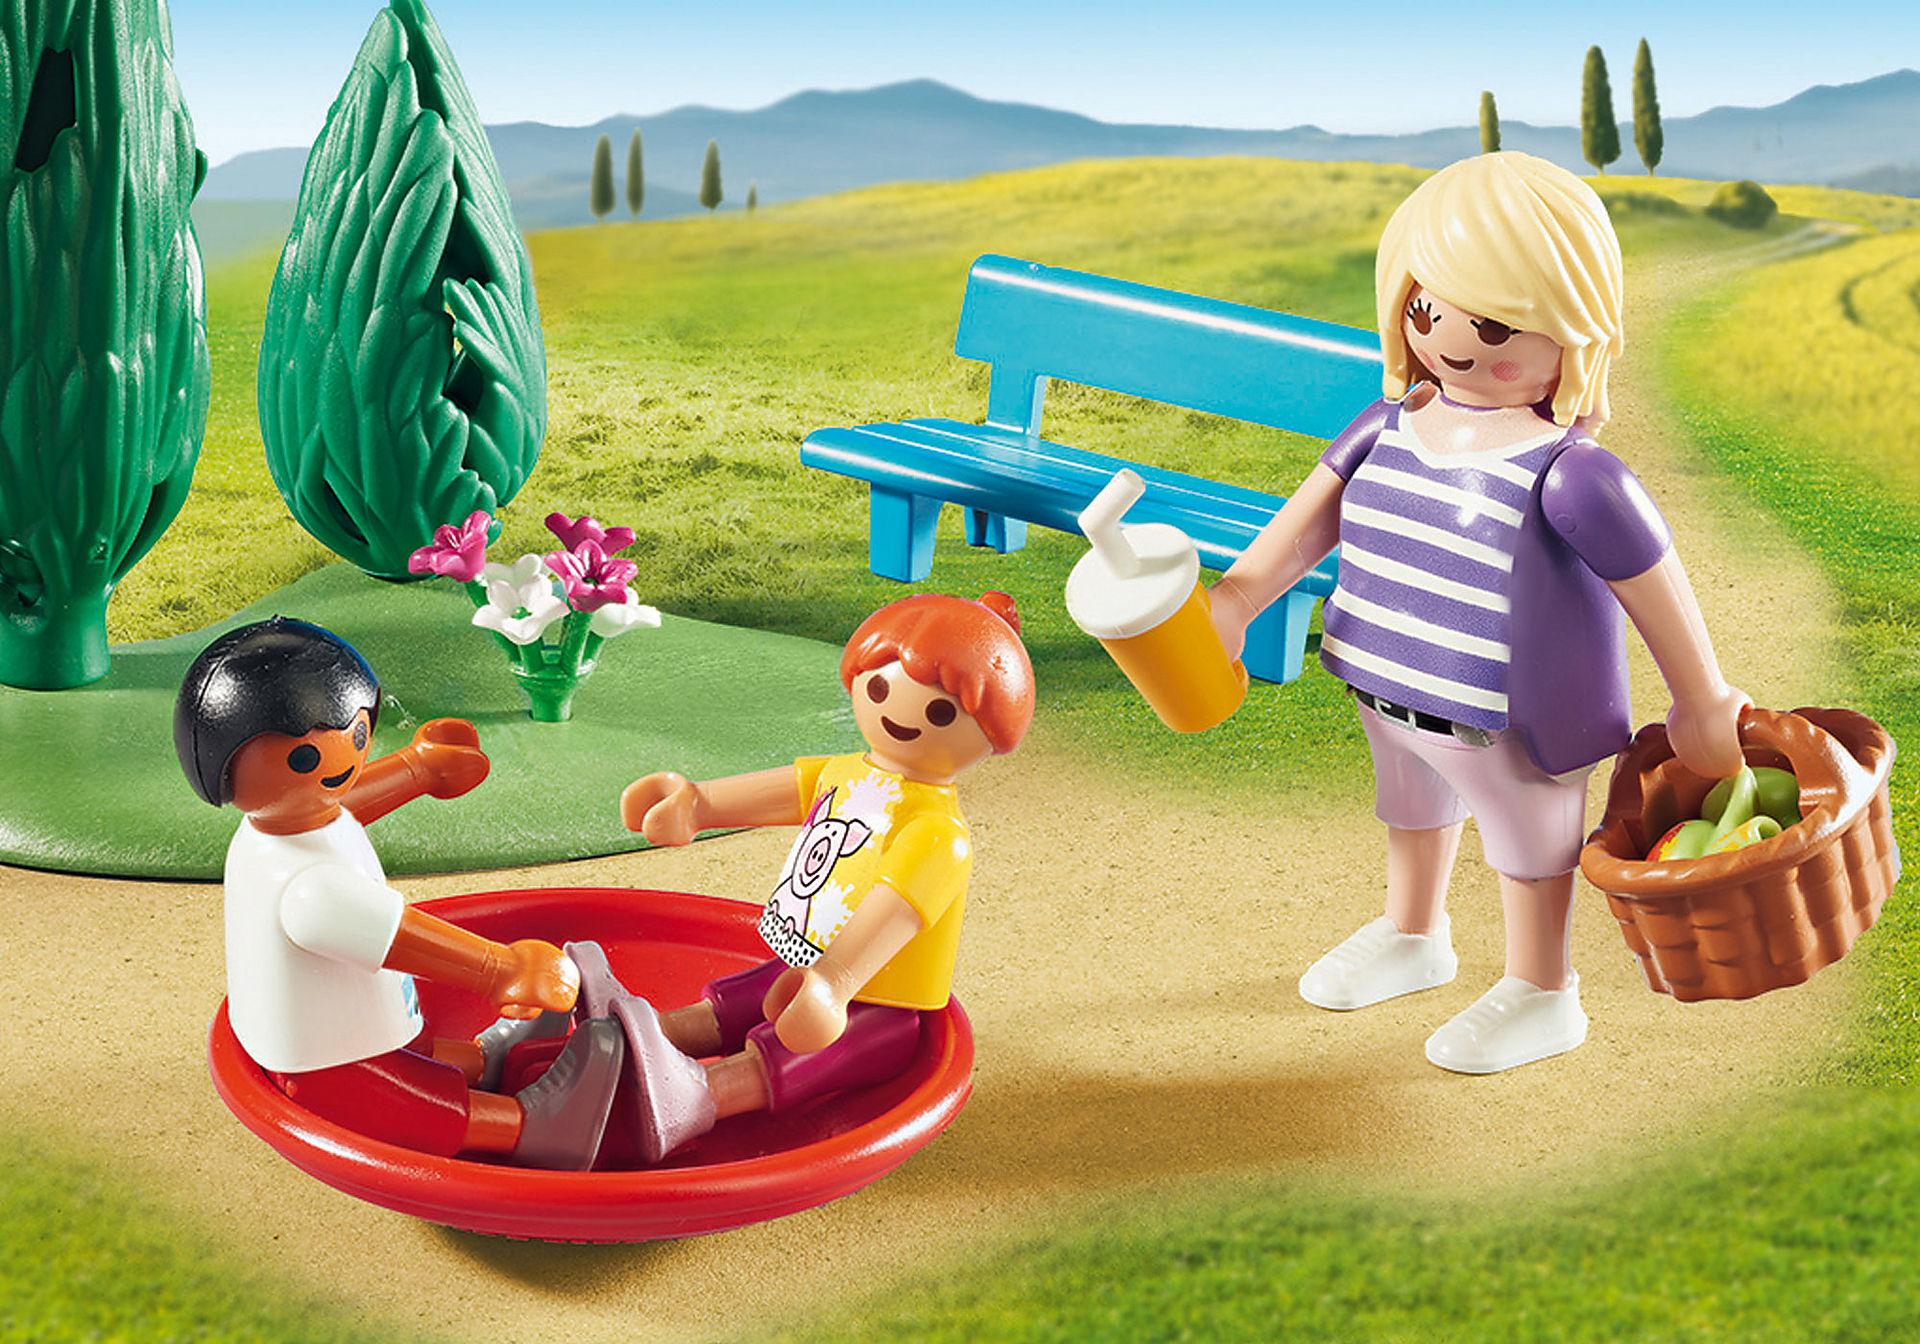 http://media.playmobil.com/i/playmobil/9423_product_extra2/Grote speeltuin